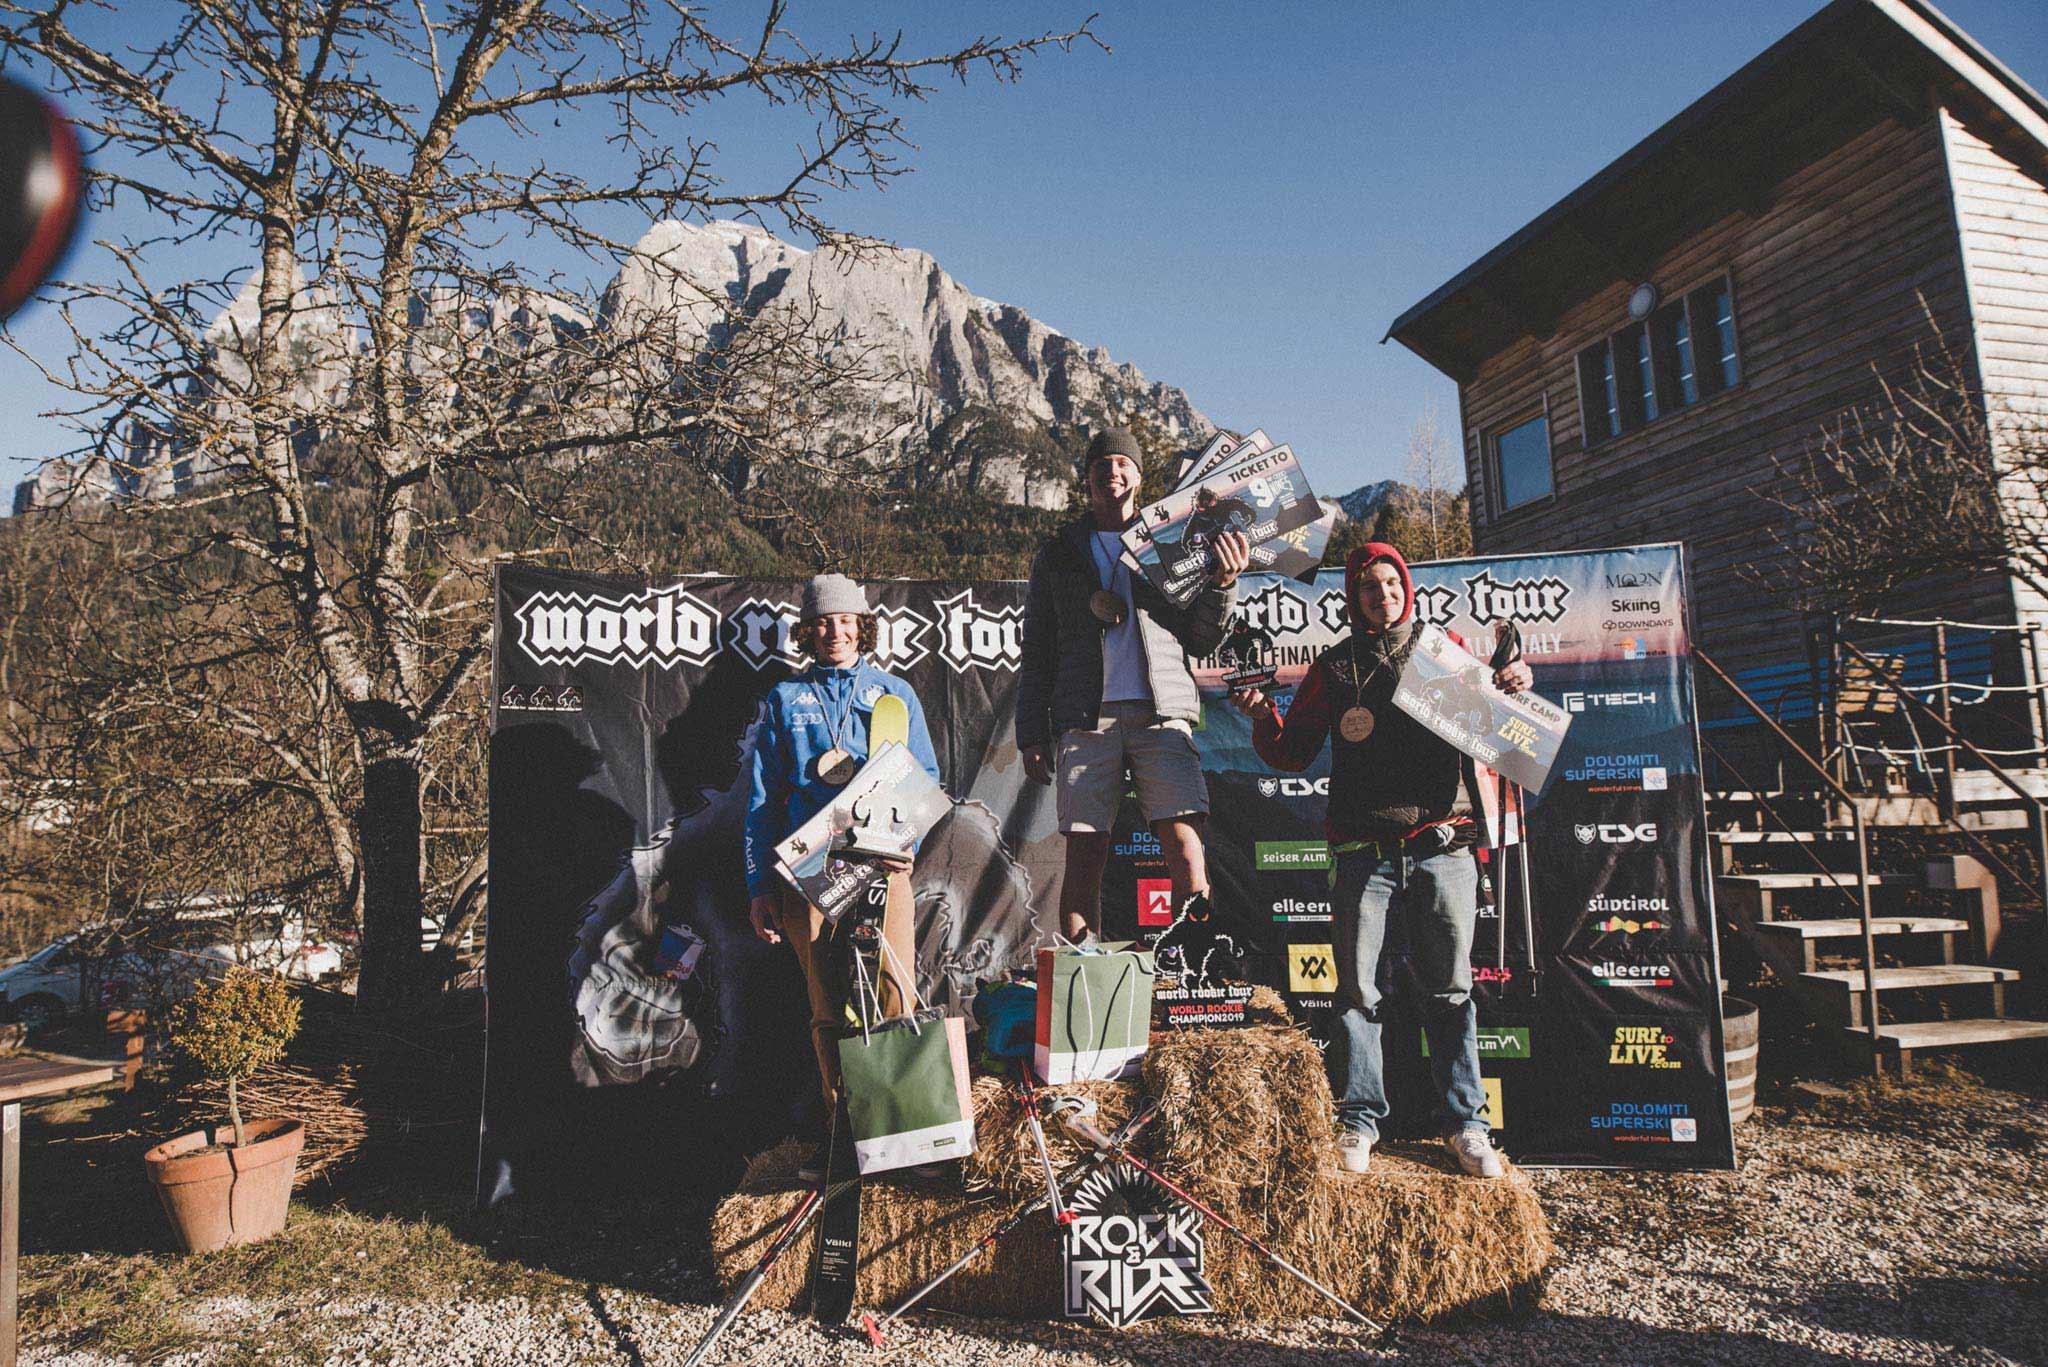 Die drei besten Jungs bei der Freeski World Rookie Tour 2019: Leonardo Donaggio (ITA), Ulrik Samnøy (Norway) & Tevje Skaug - Foto: Ania Grzelka